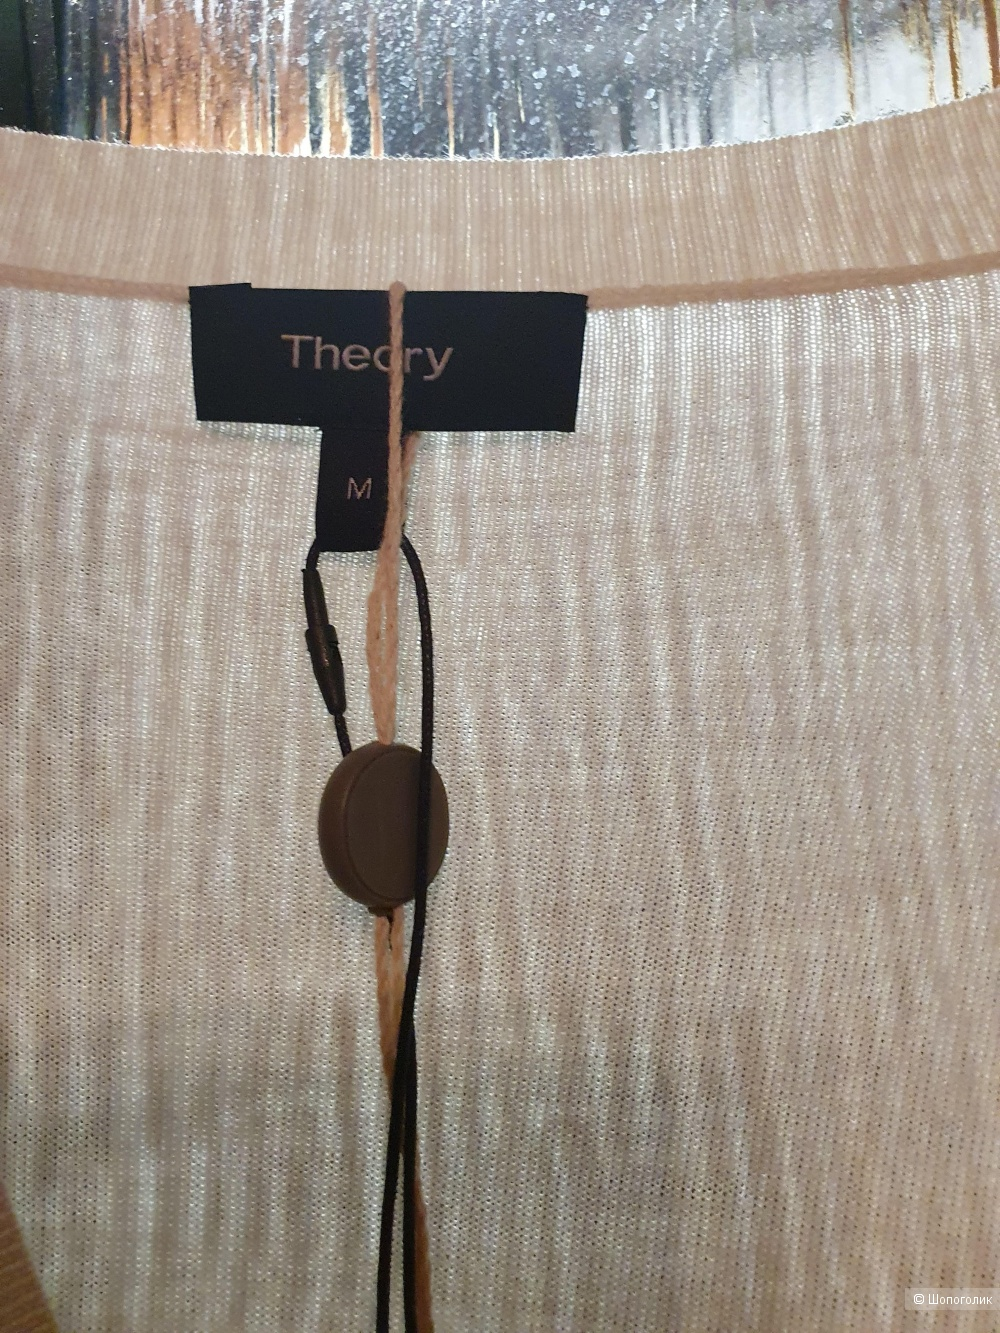 Theory джемпер из 100% мериноса, размер м